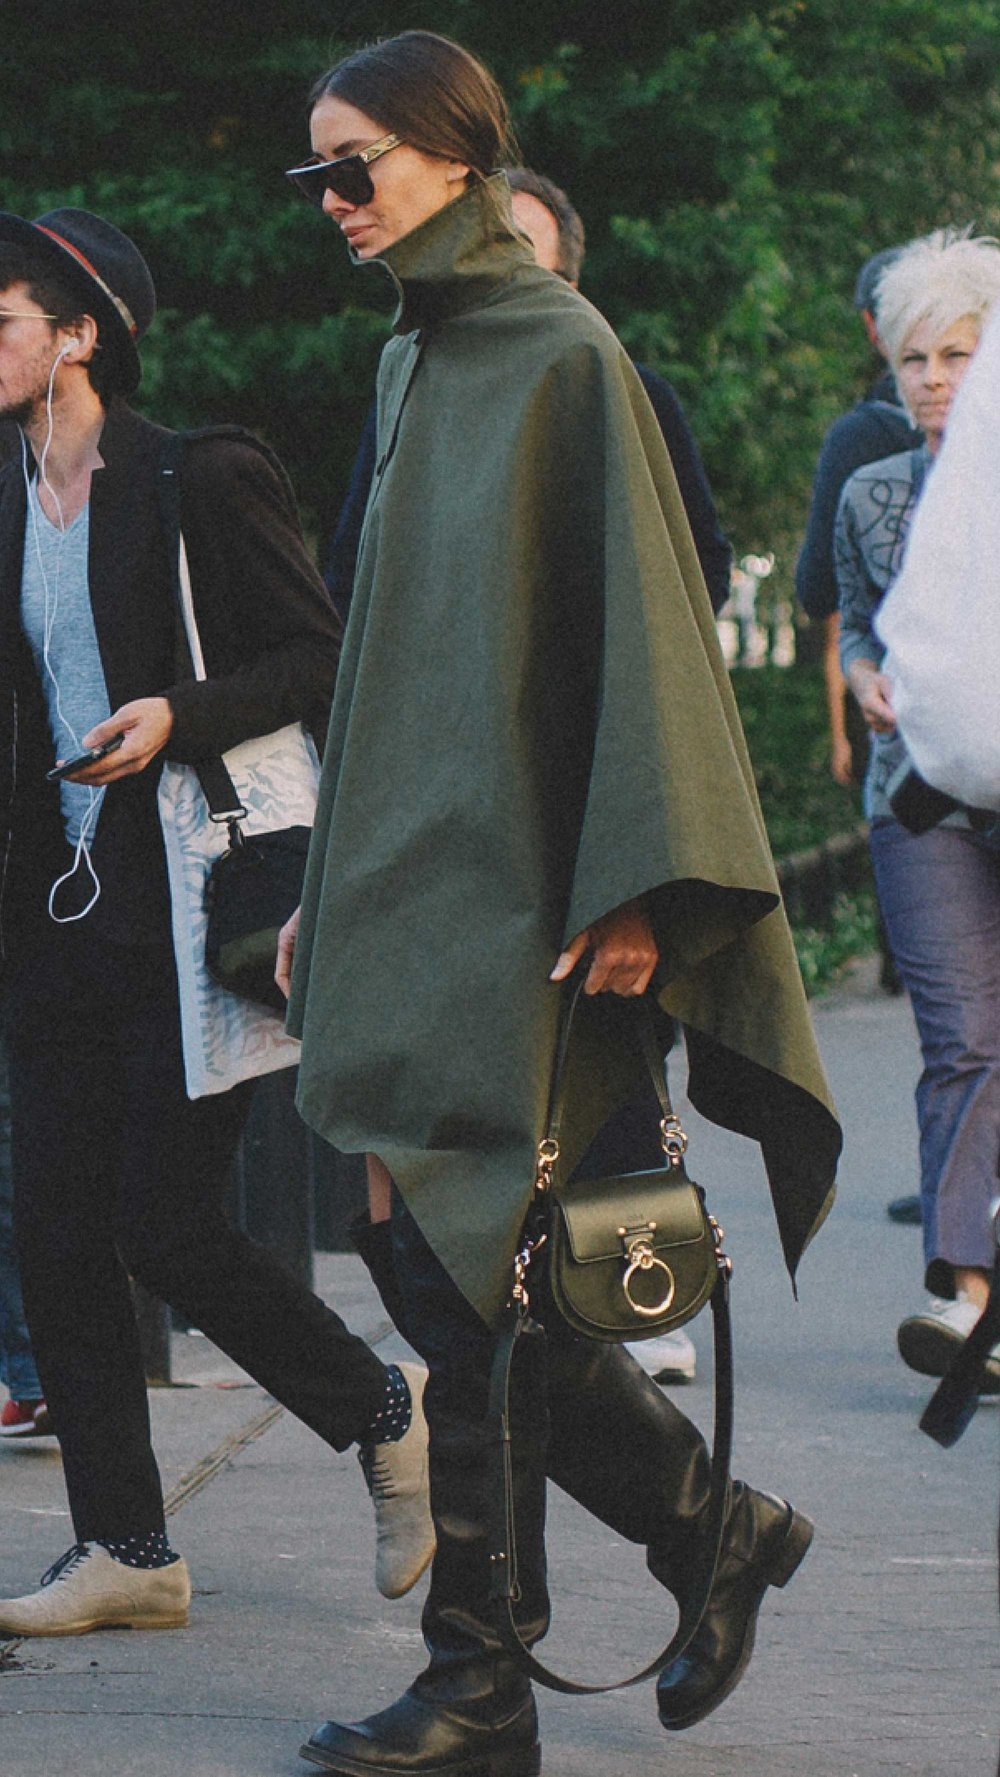 12 Best Chloe bags of Fashion Week -  CHLOe Roy mini leather bucket bag and Chloe Small Tess Leather Shoulder Bag14.jpg